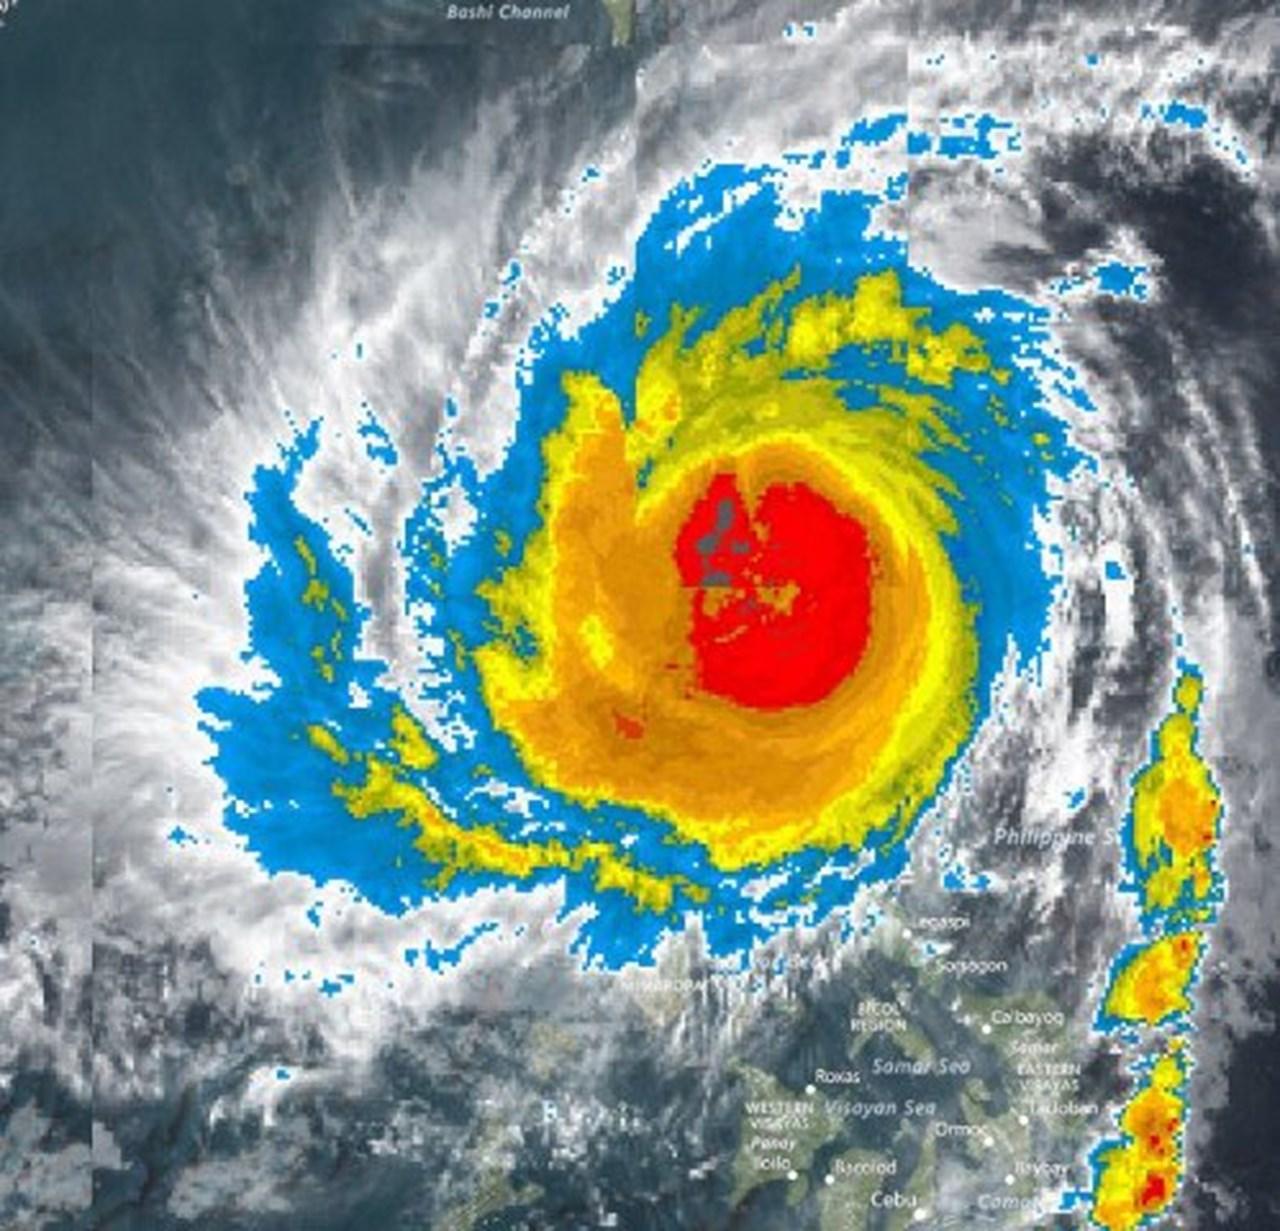 Typhoon Yutu: 4 survivors, 3 dead, several missing in Philippine landslide